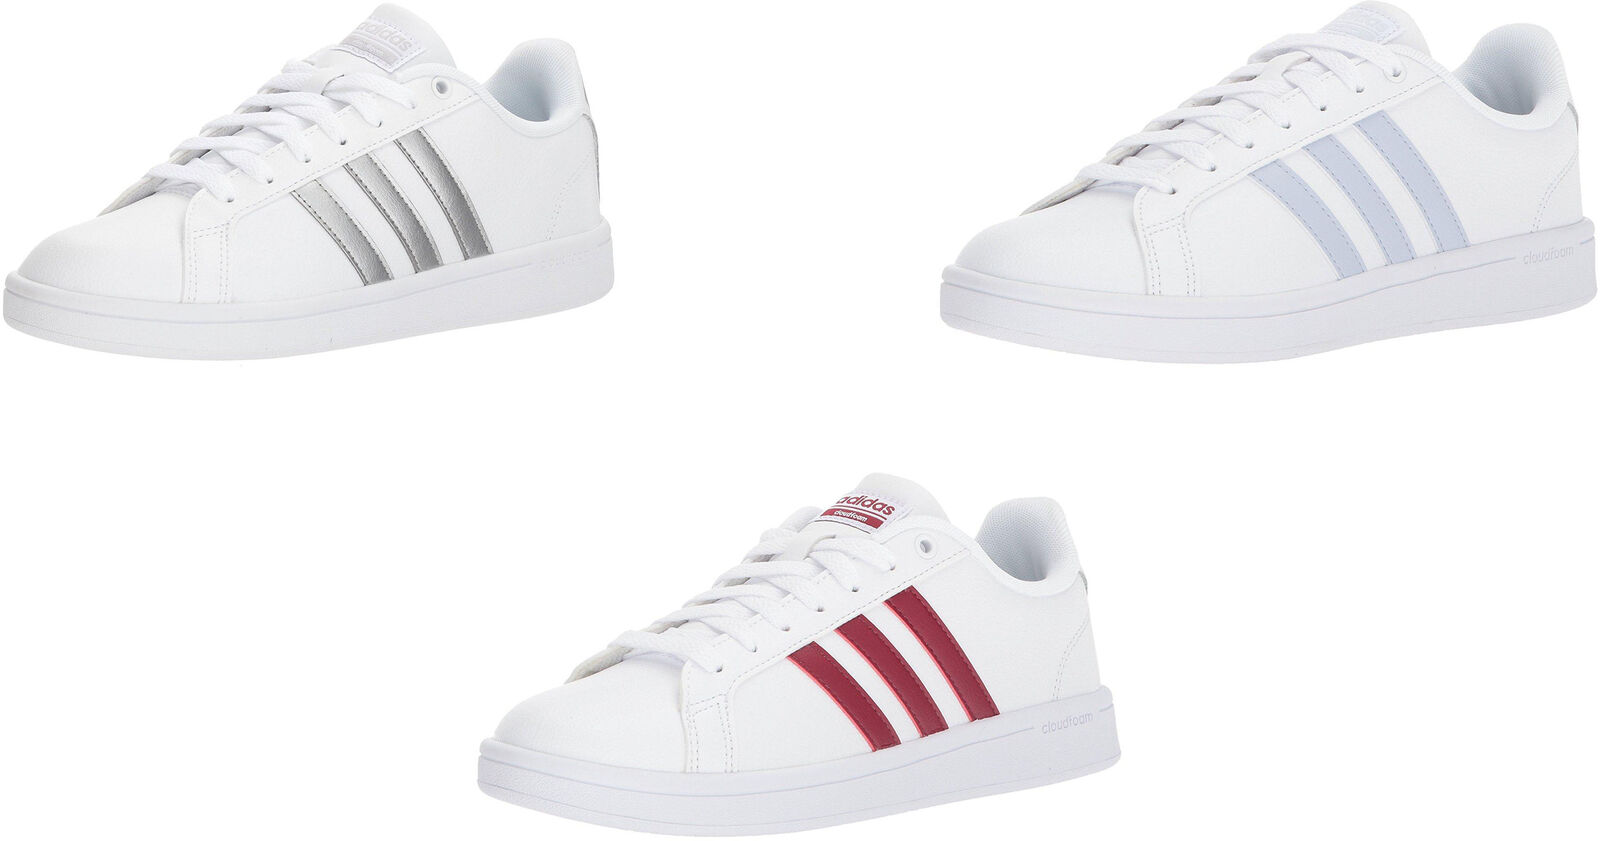 adidas women's shoes cloudfoam advantage sneakers